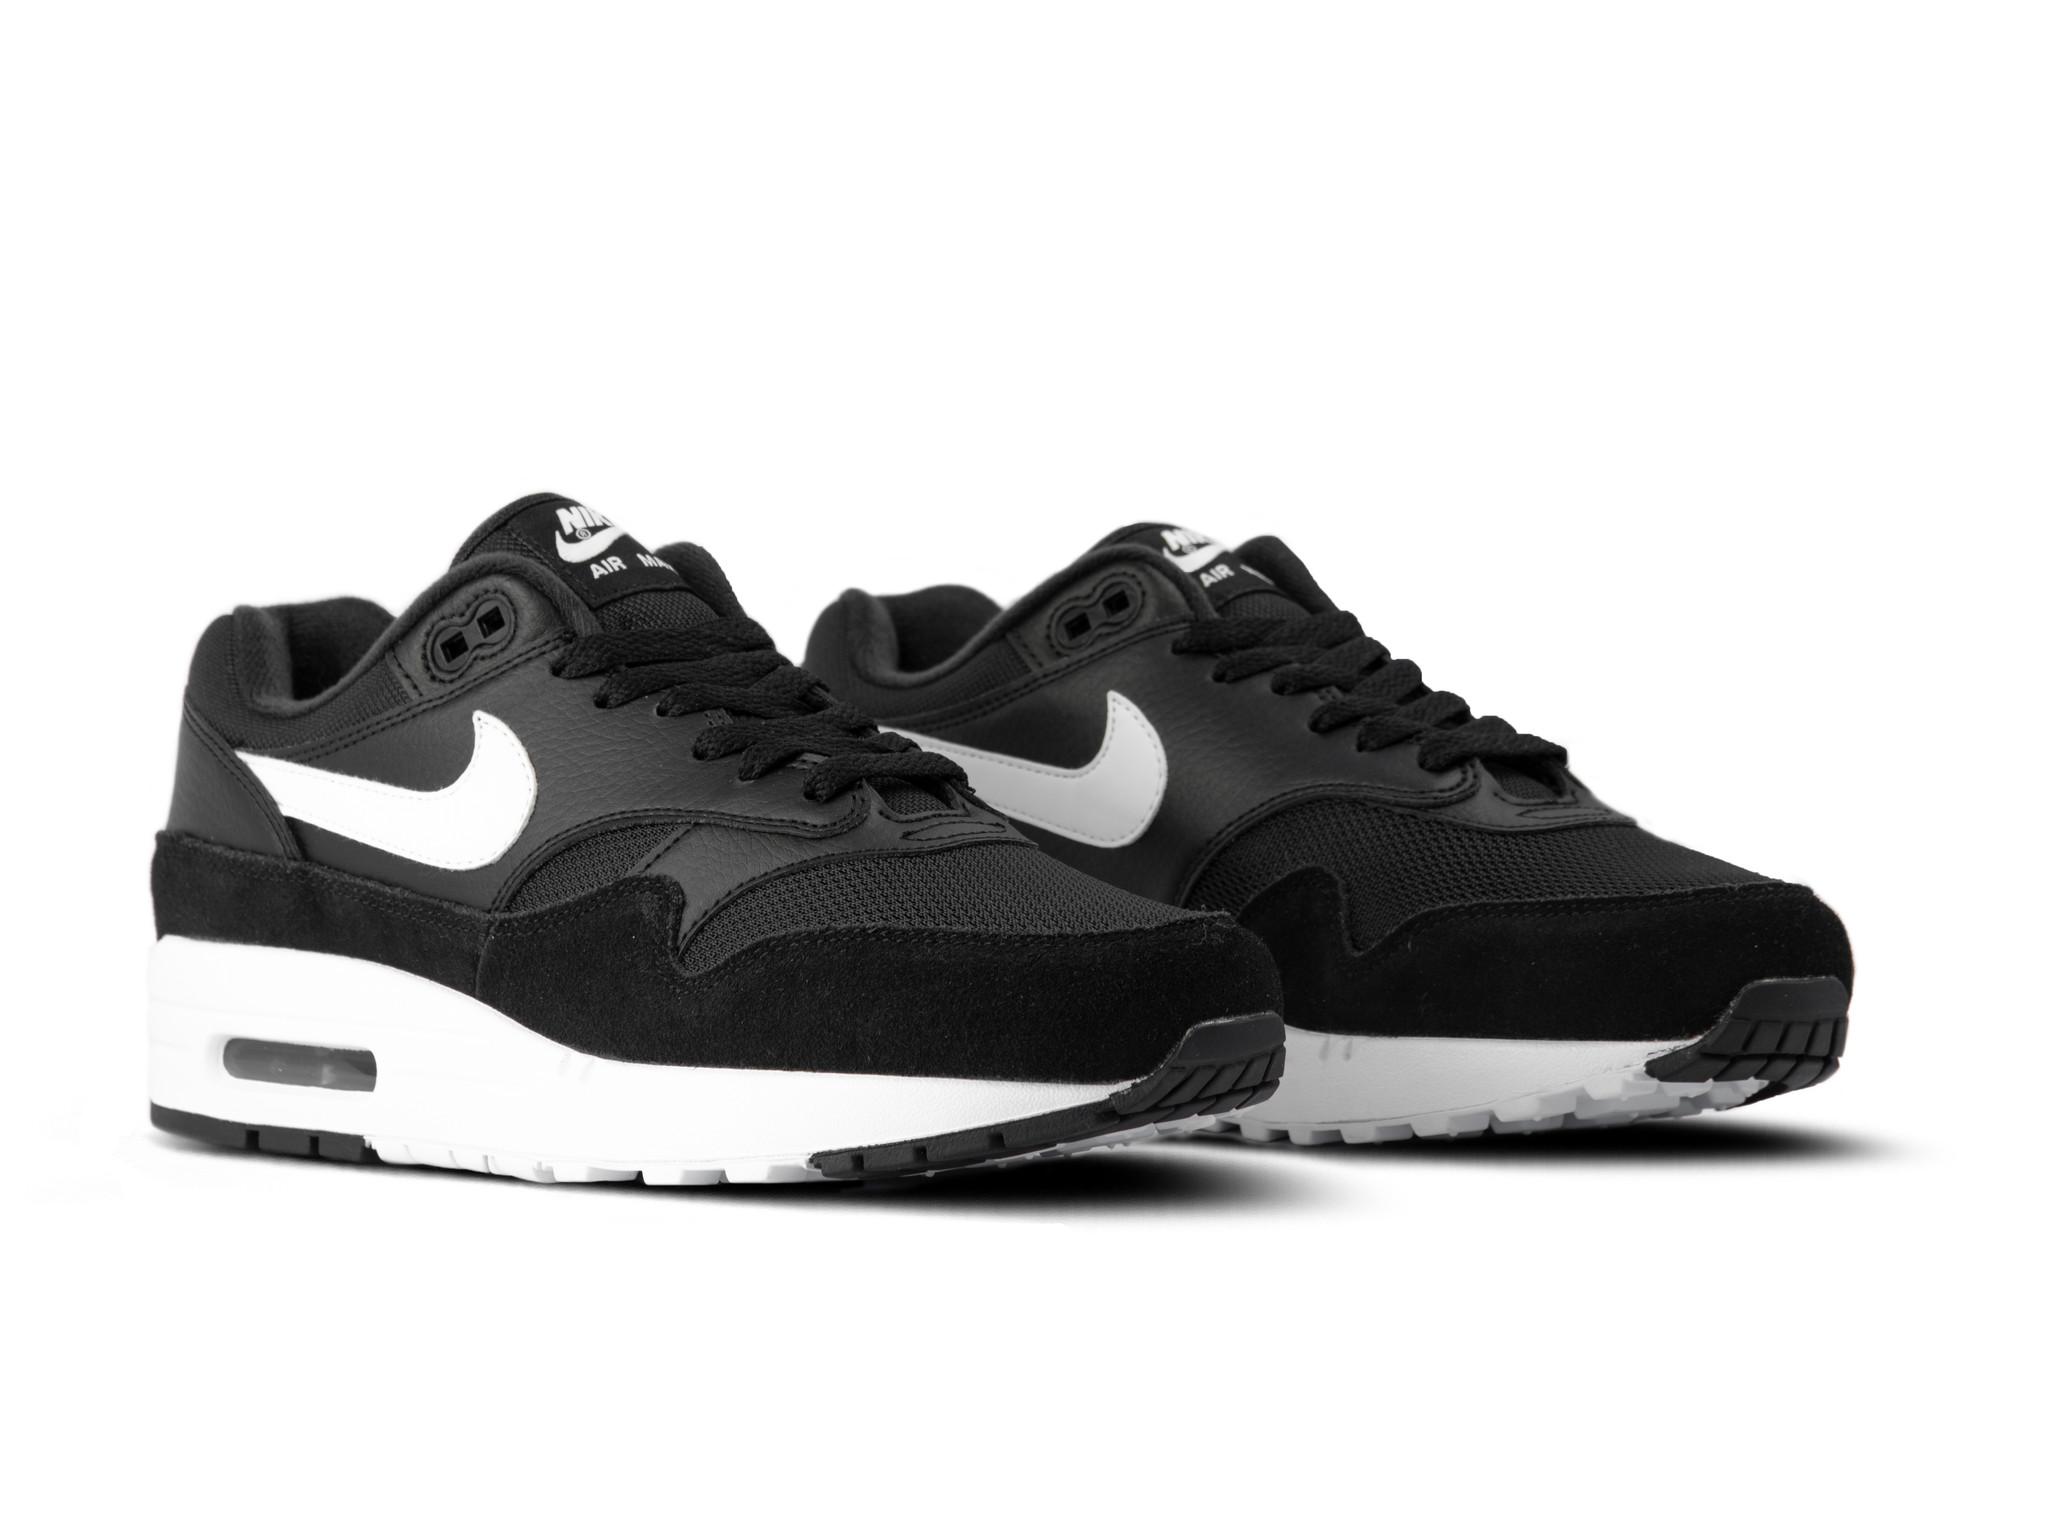 Nike Air Max 1 Black White AH8145 014 | Bruut Online shop